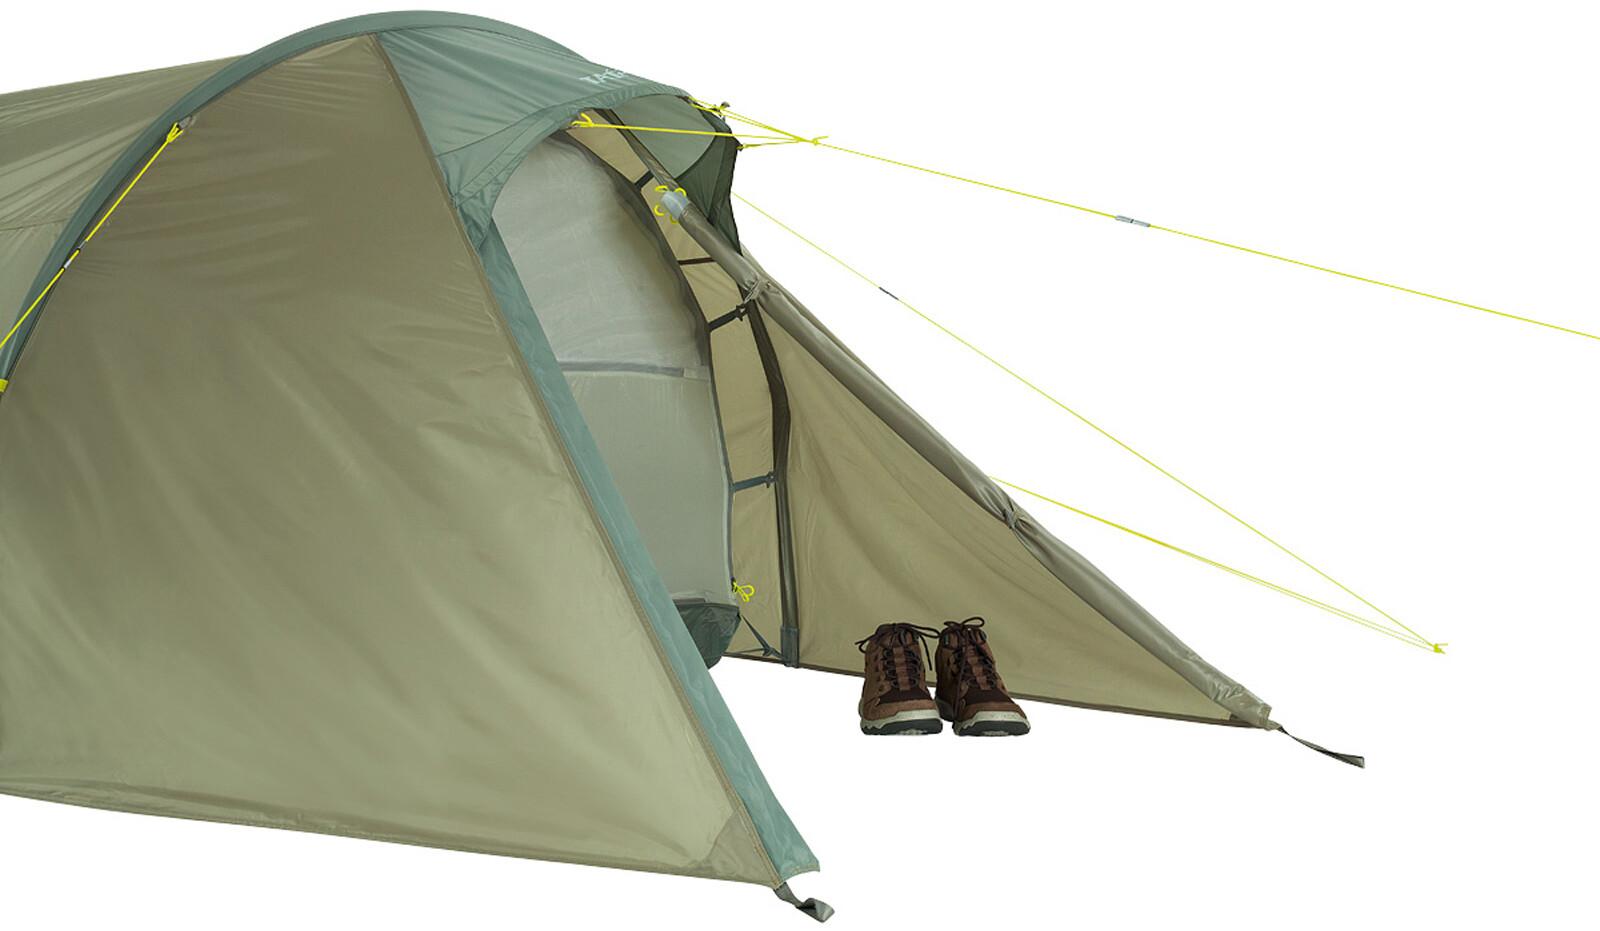 Tatonka Narvik 2 2 Personen Zelt online kaufen